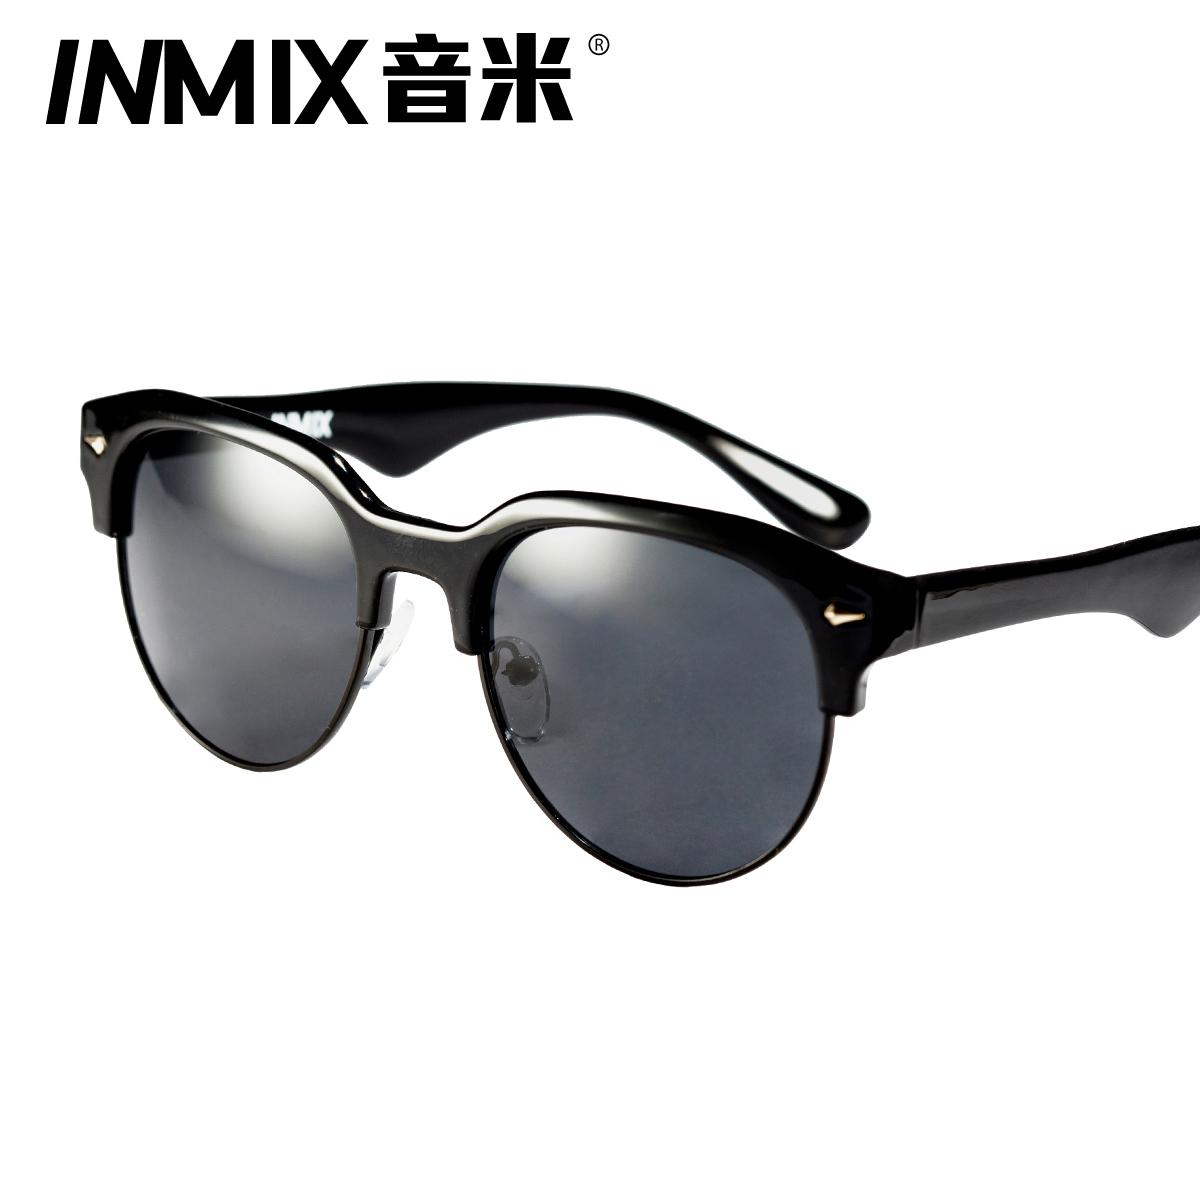 Солнцезащитные очки In Mix Inmix 2013